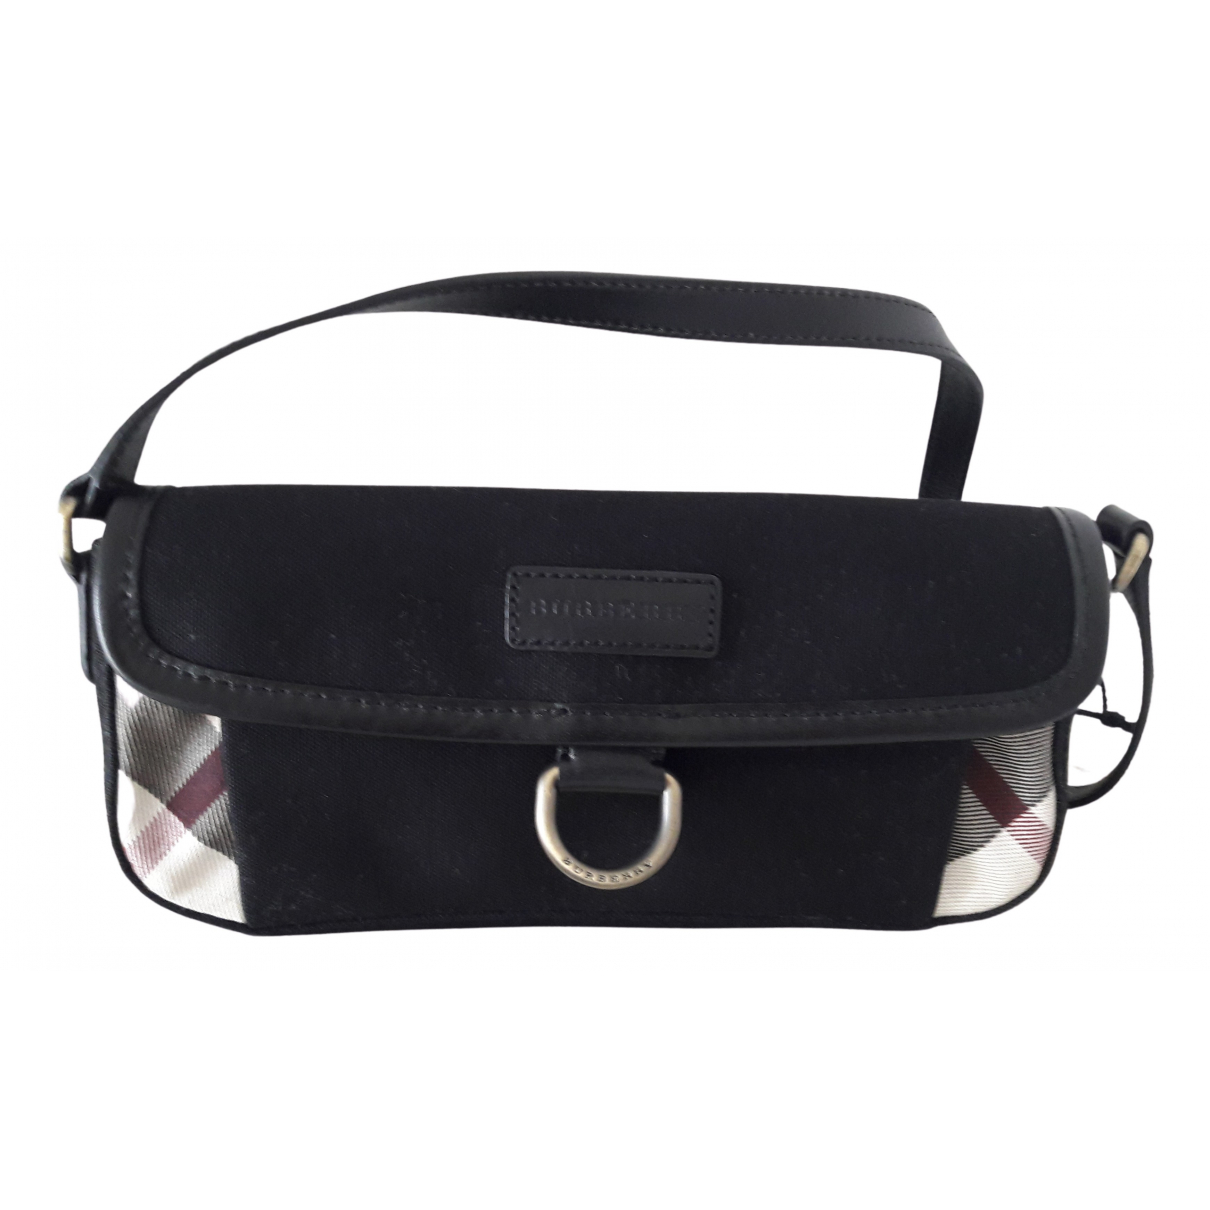 Burberry N Black Cotton handbag for Women N